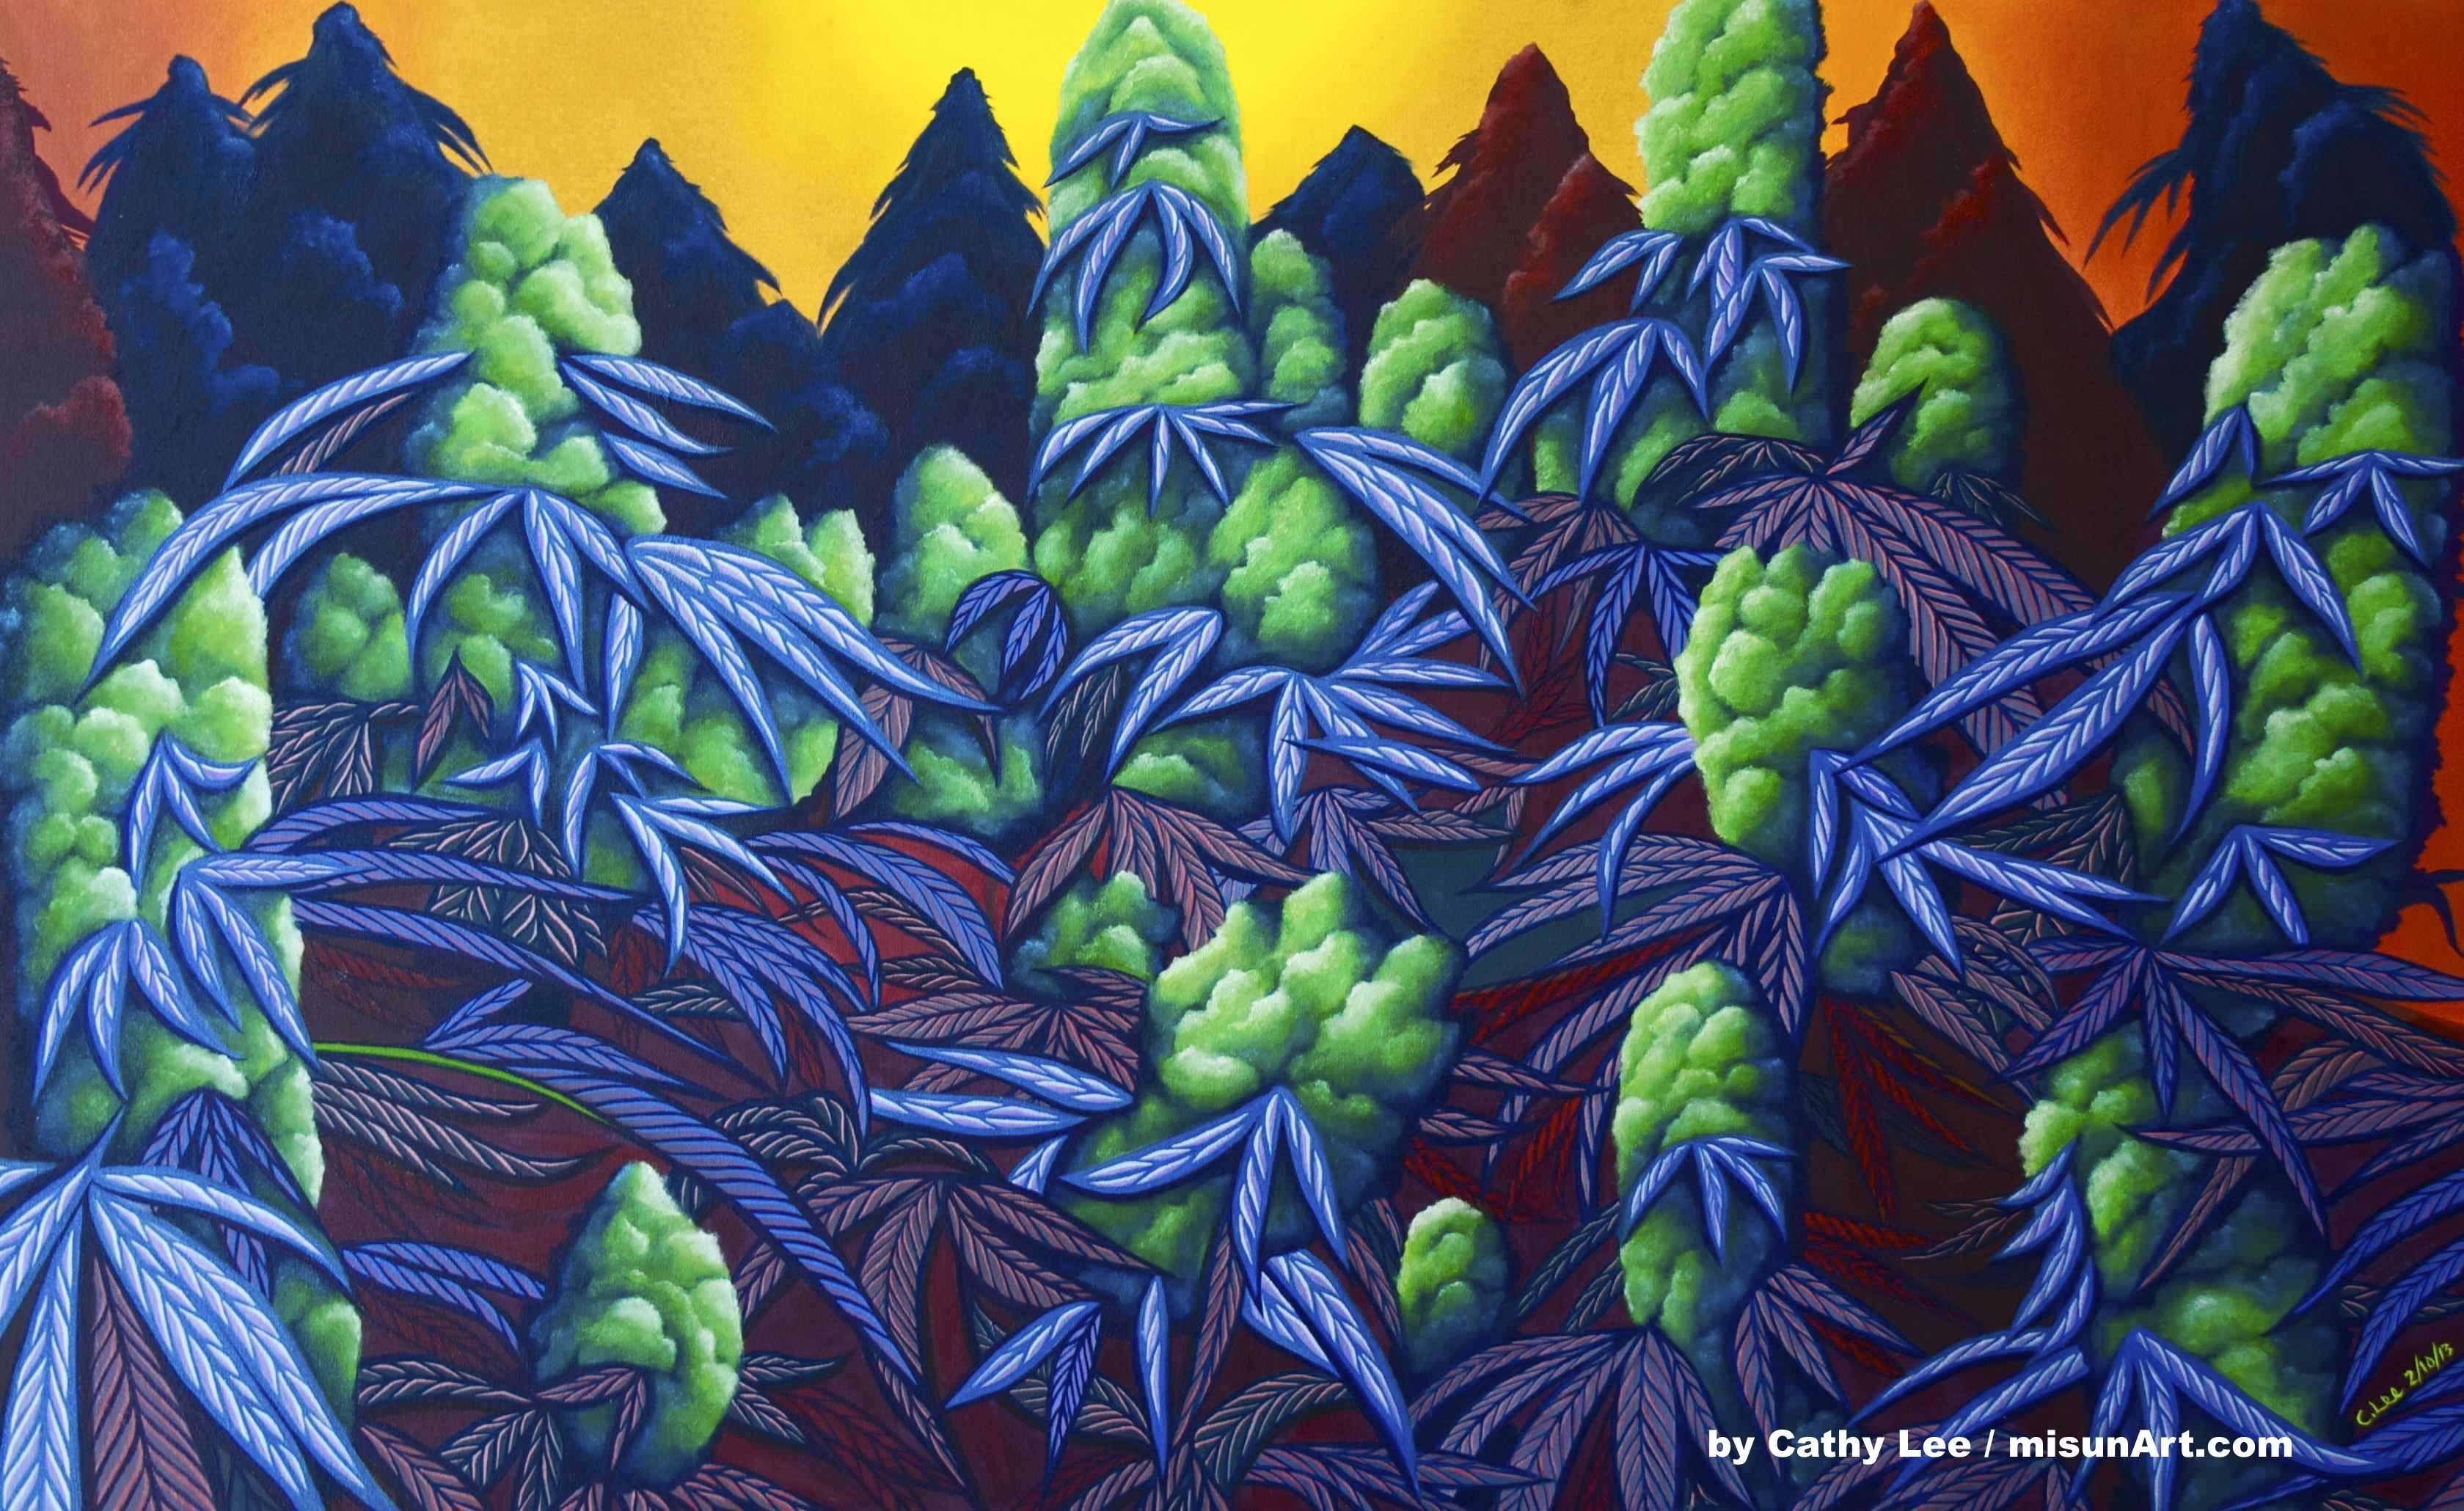 Weed Art Wallpapers Wallpaper Cave